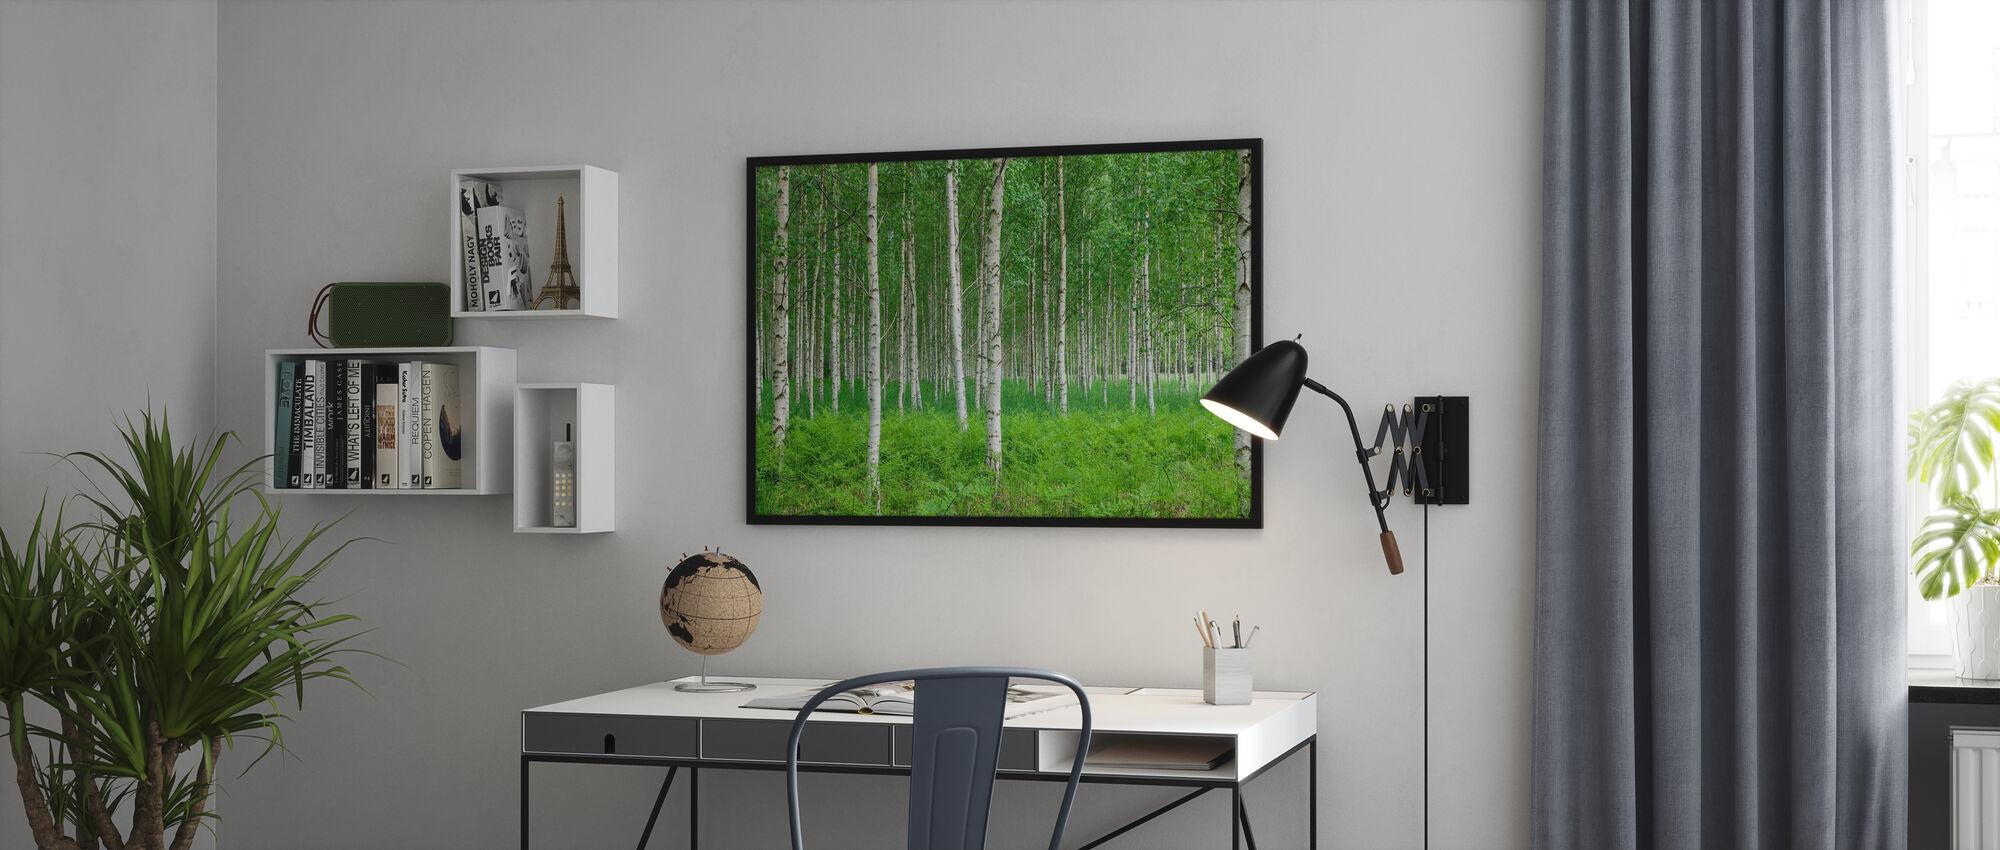 Sommar Björkskog - Inramad tavla - Kontor